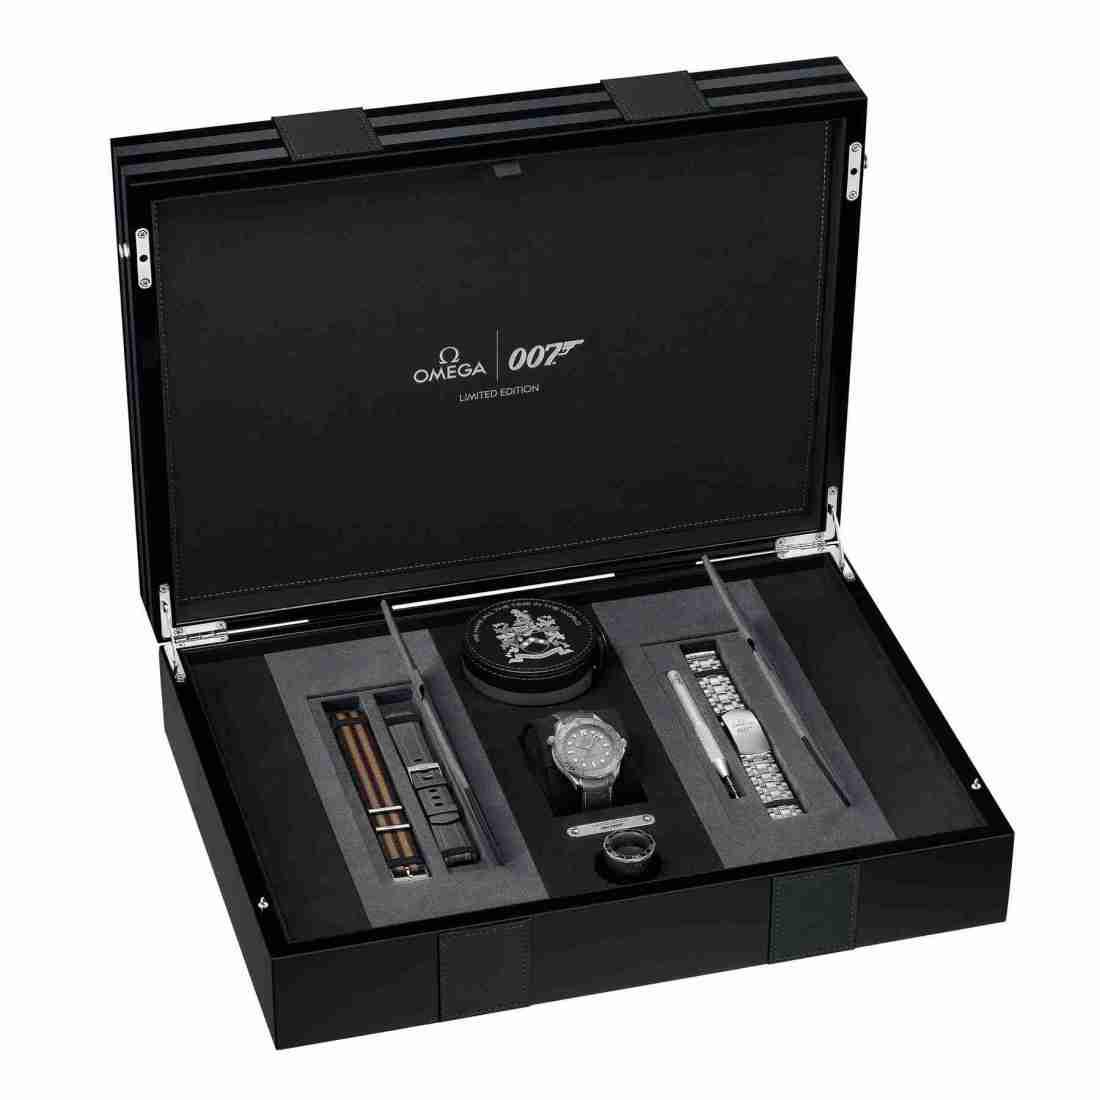 Réplicas de Relojes Omega Seamaster Professional 300M 007 Platino Edición especial para Navidad 3